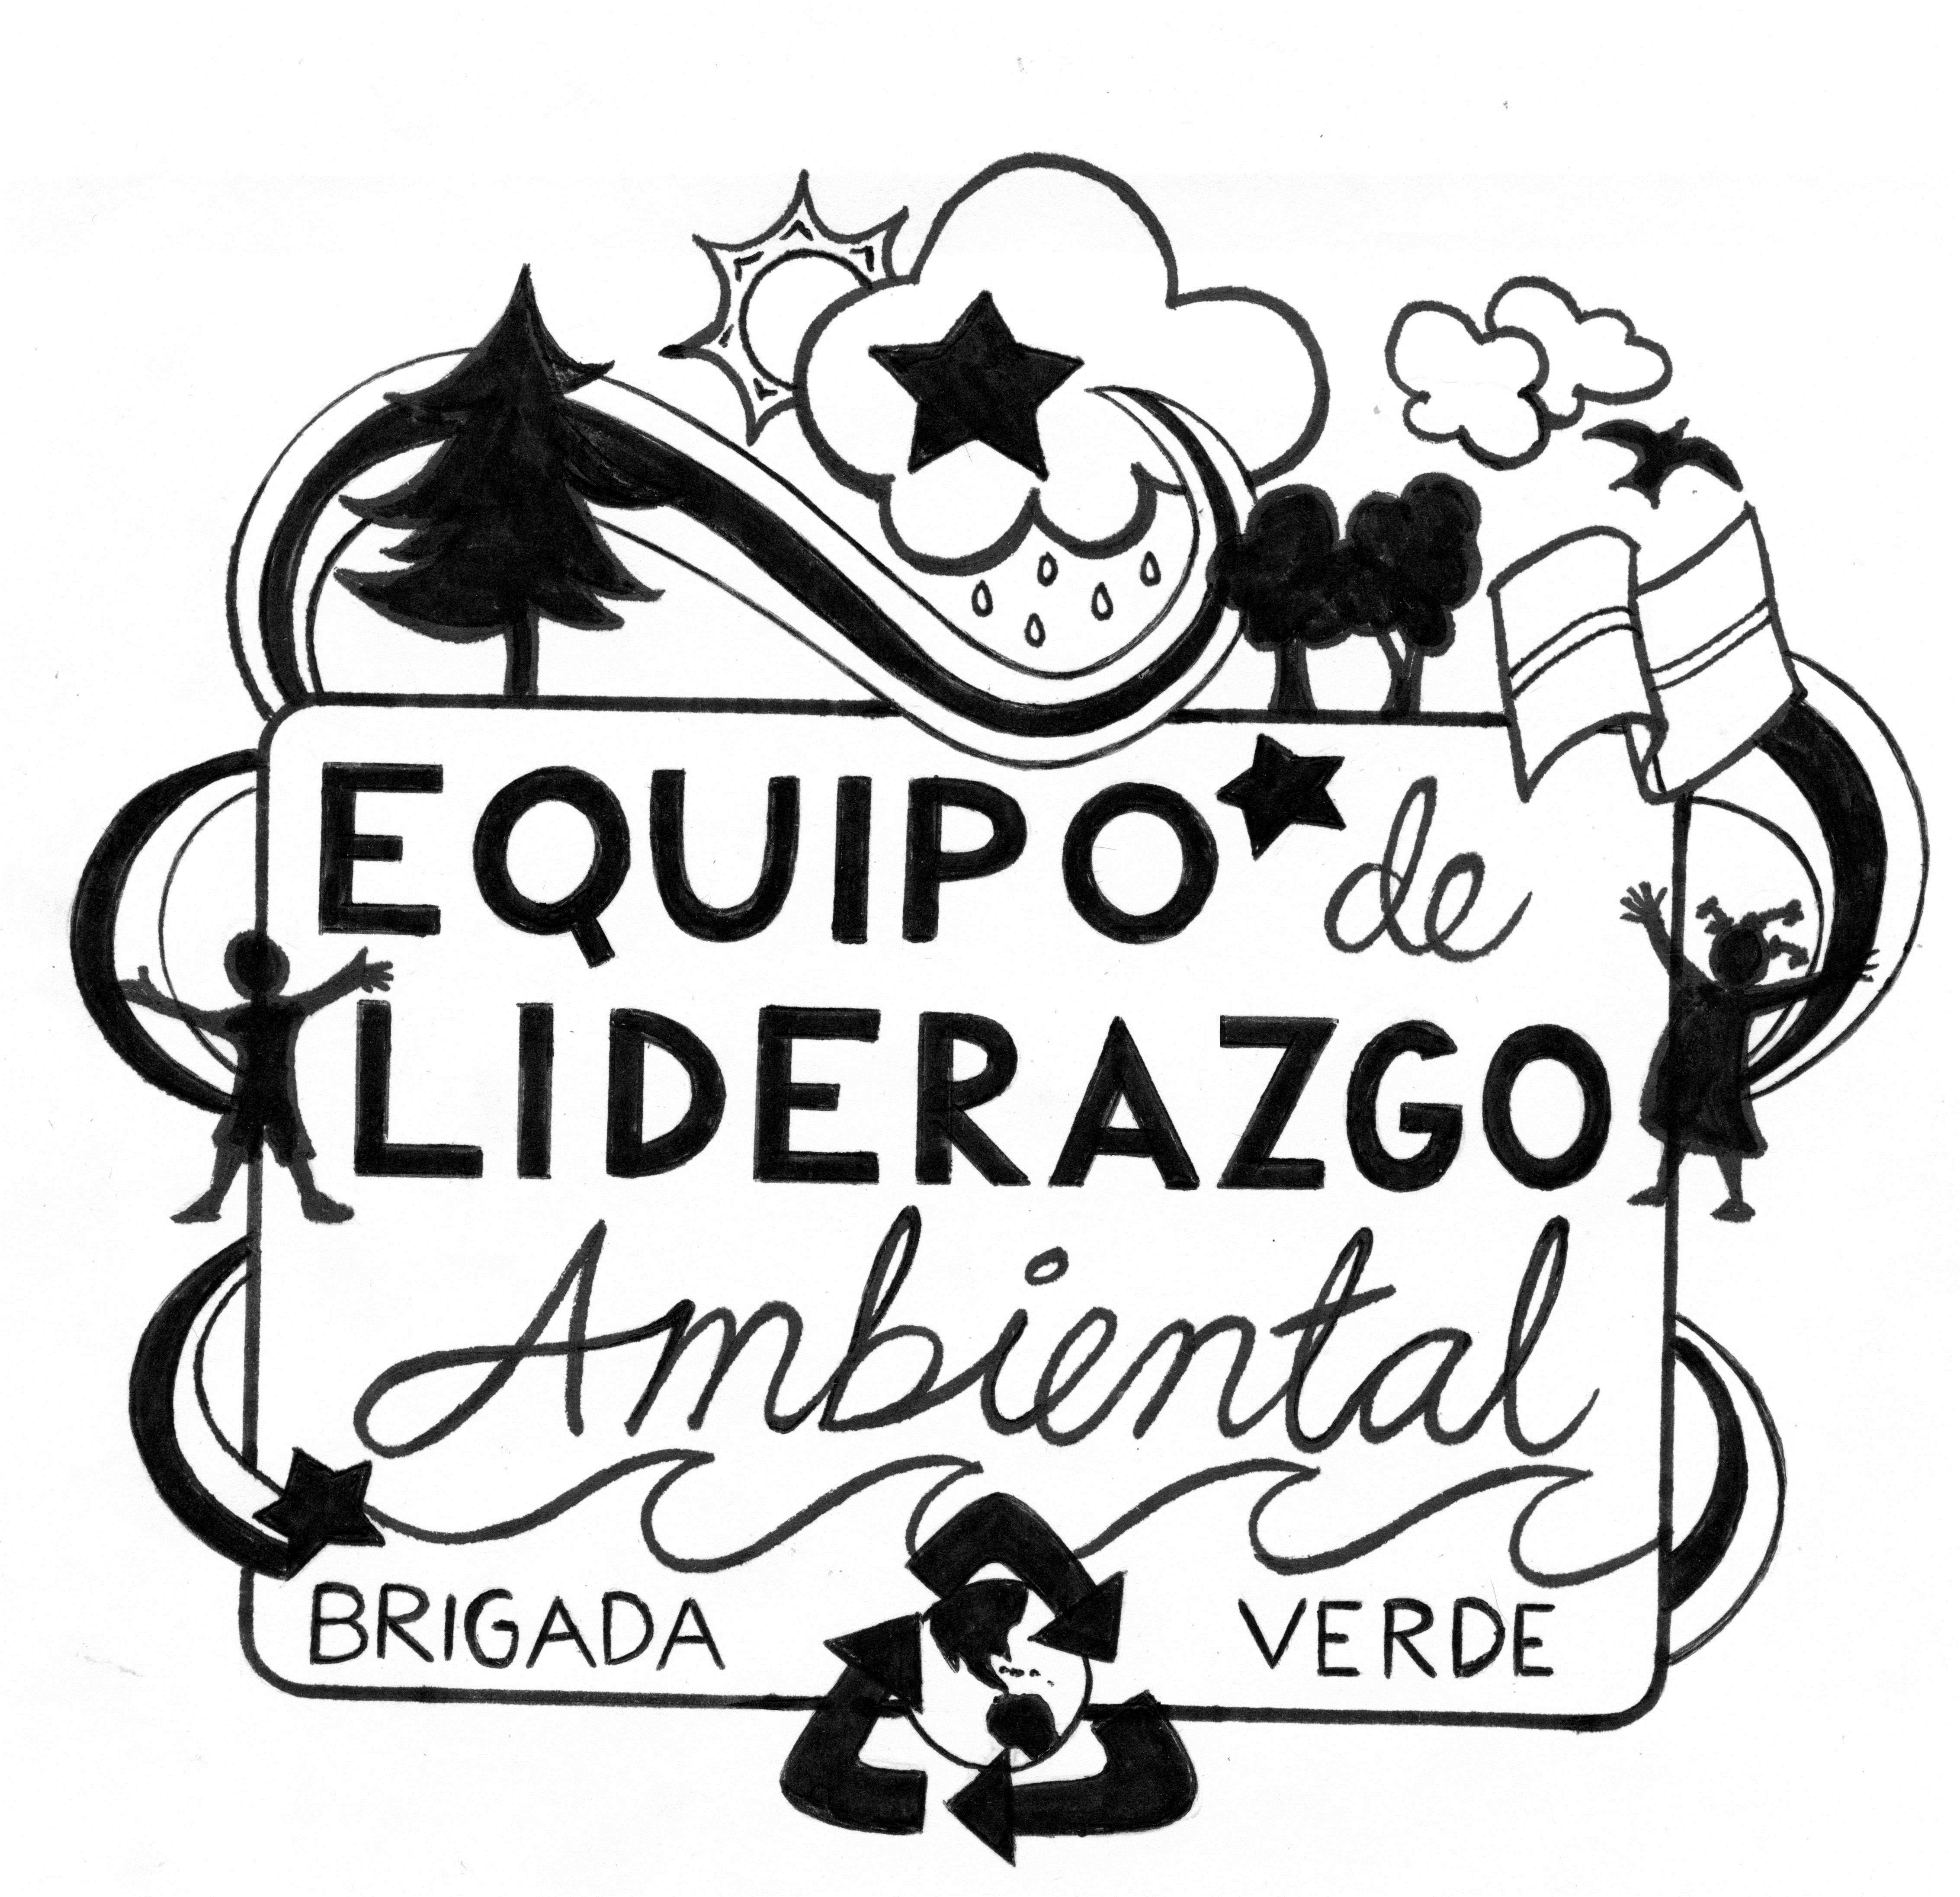 """Brigada Verde T-Shirt Design"""